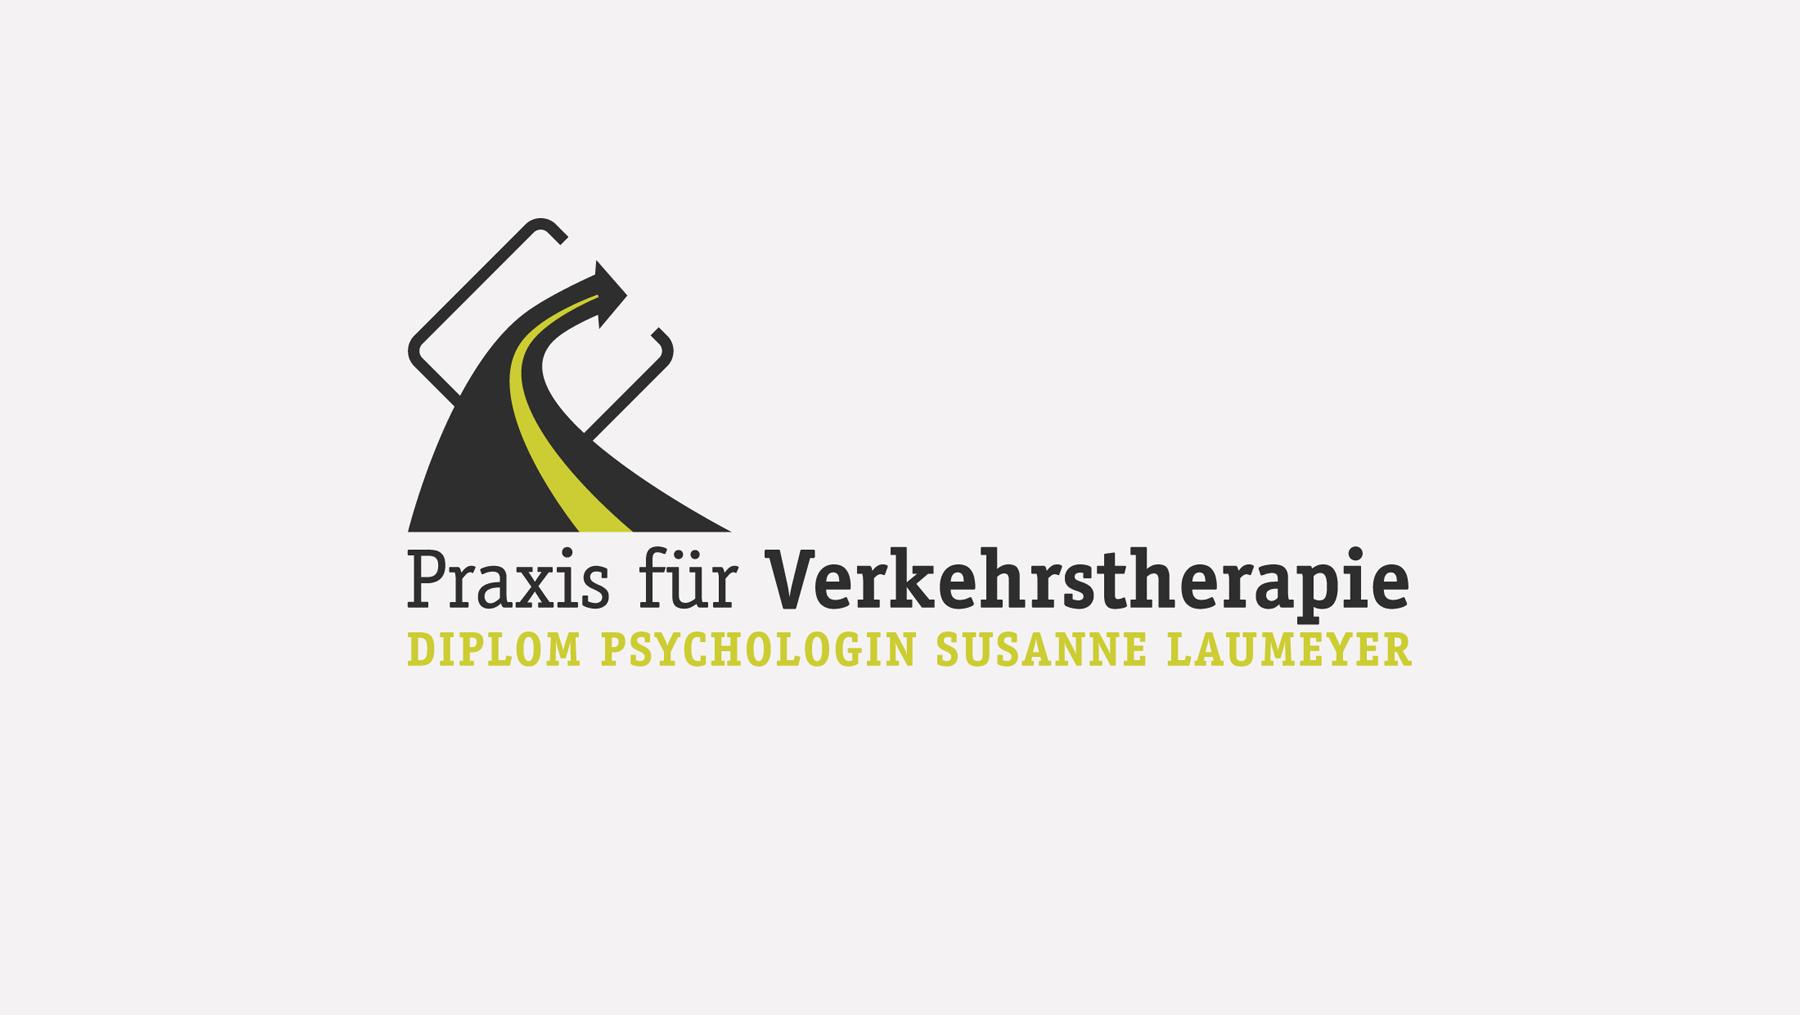 Logo - Praxis für Verkehrstherapie